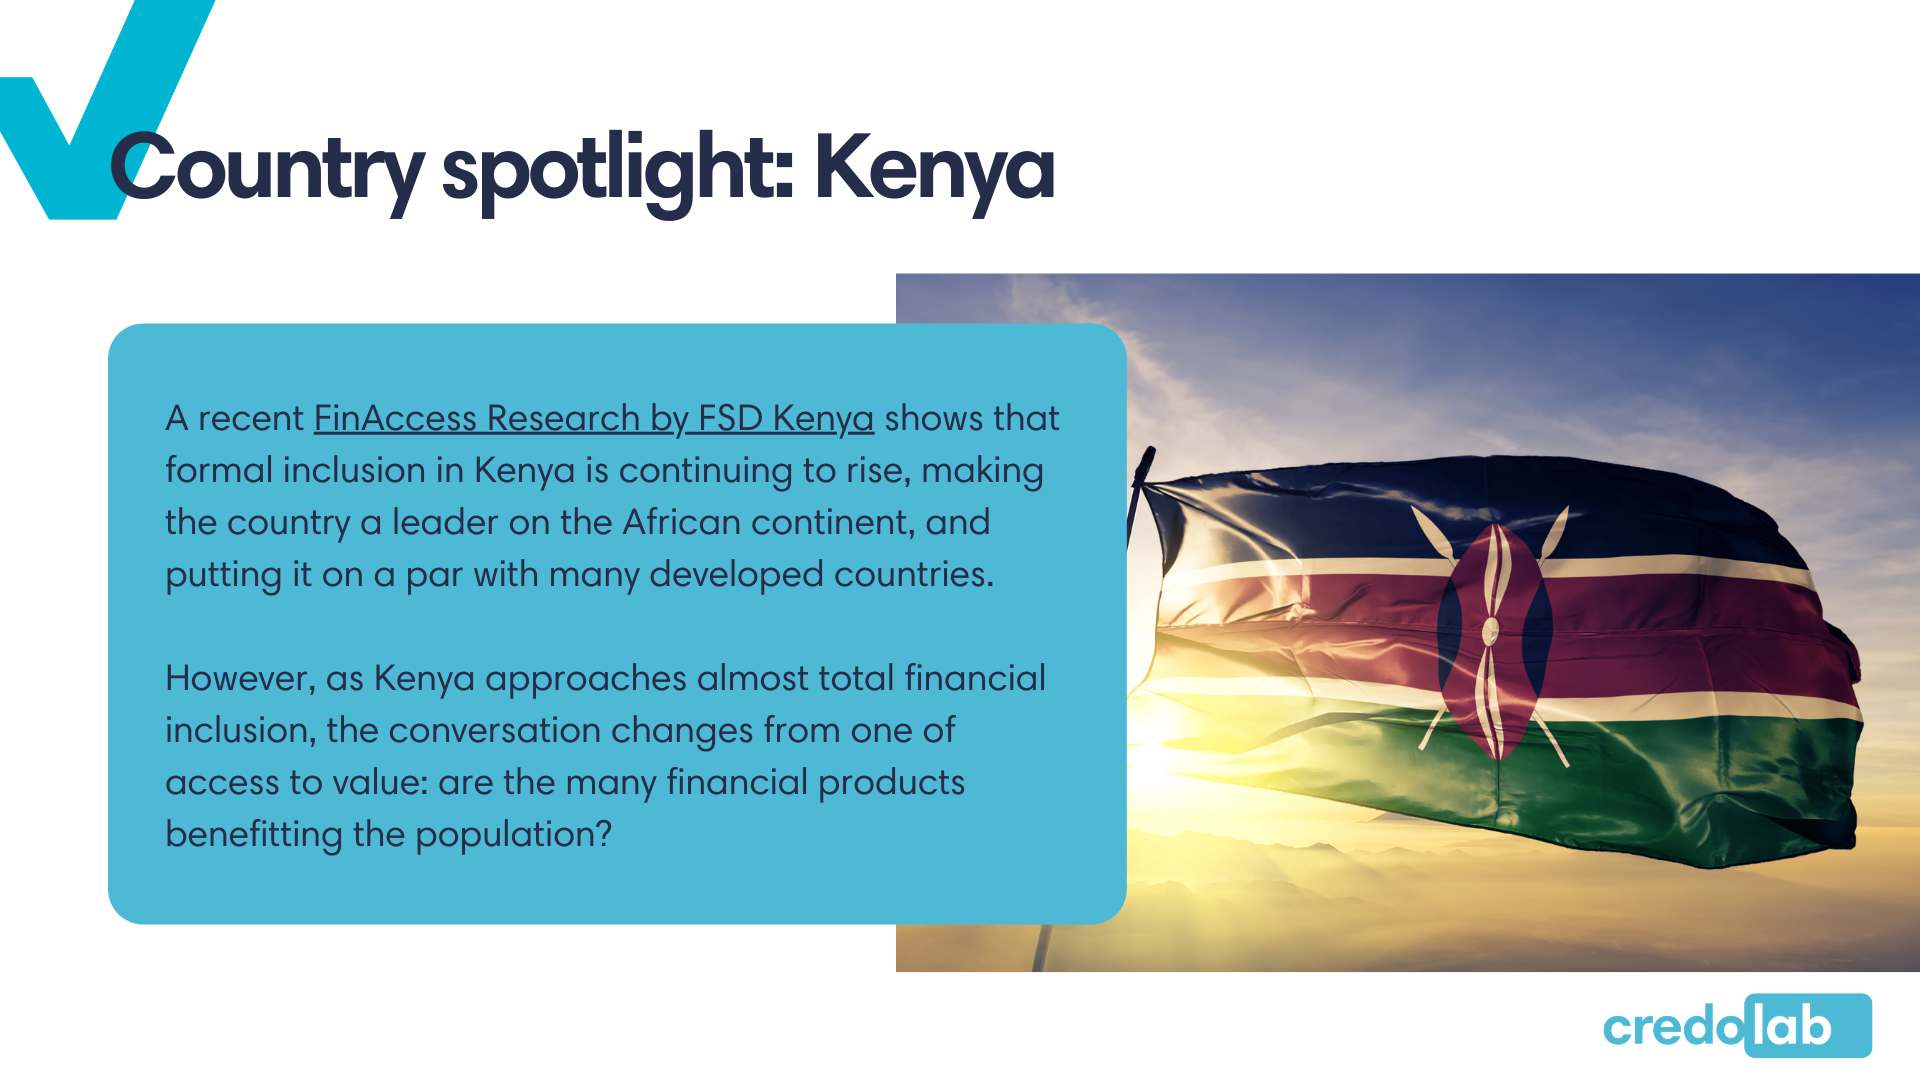 Credolab - Country Spotlight: Kenya